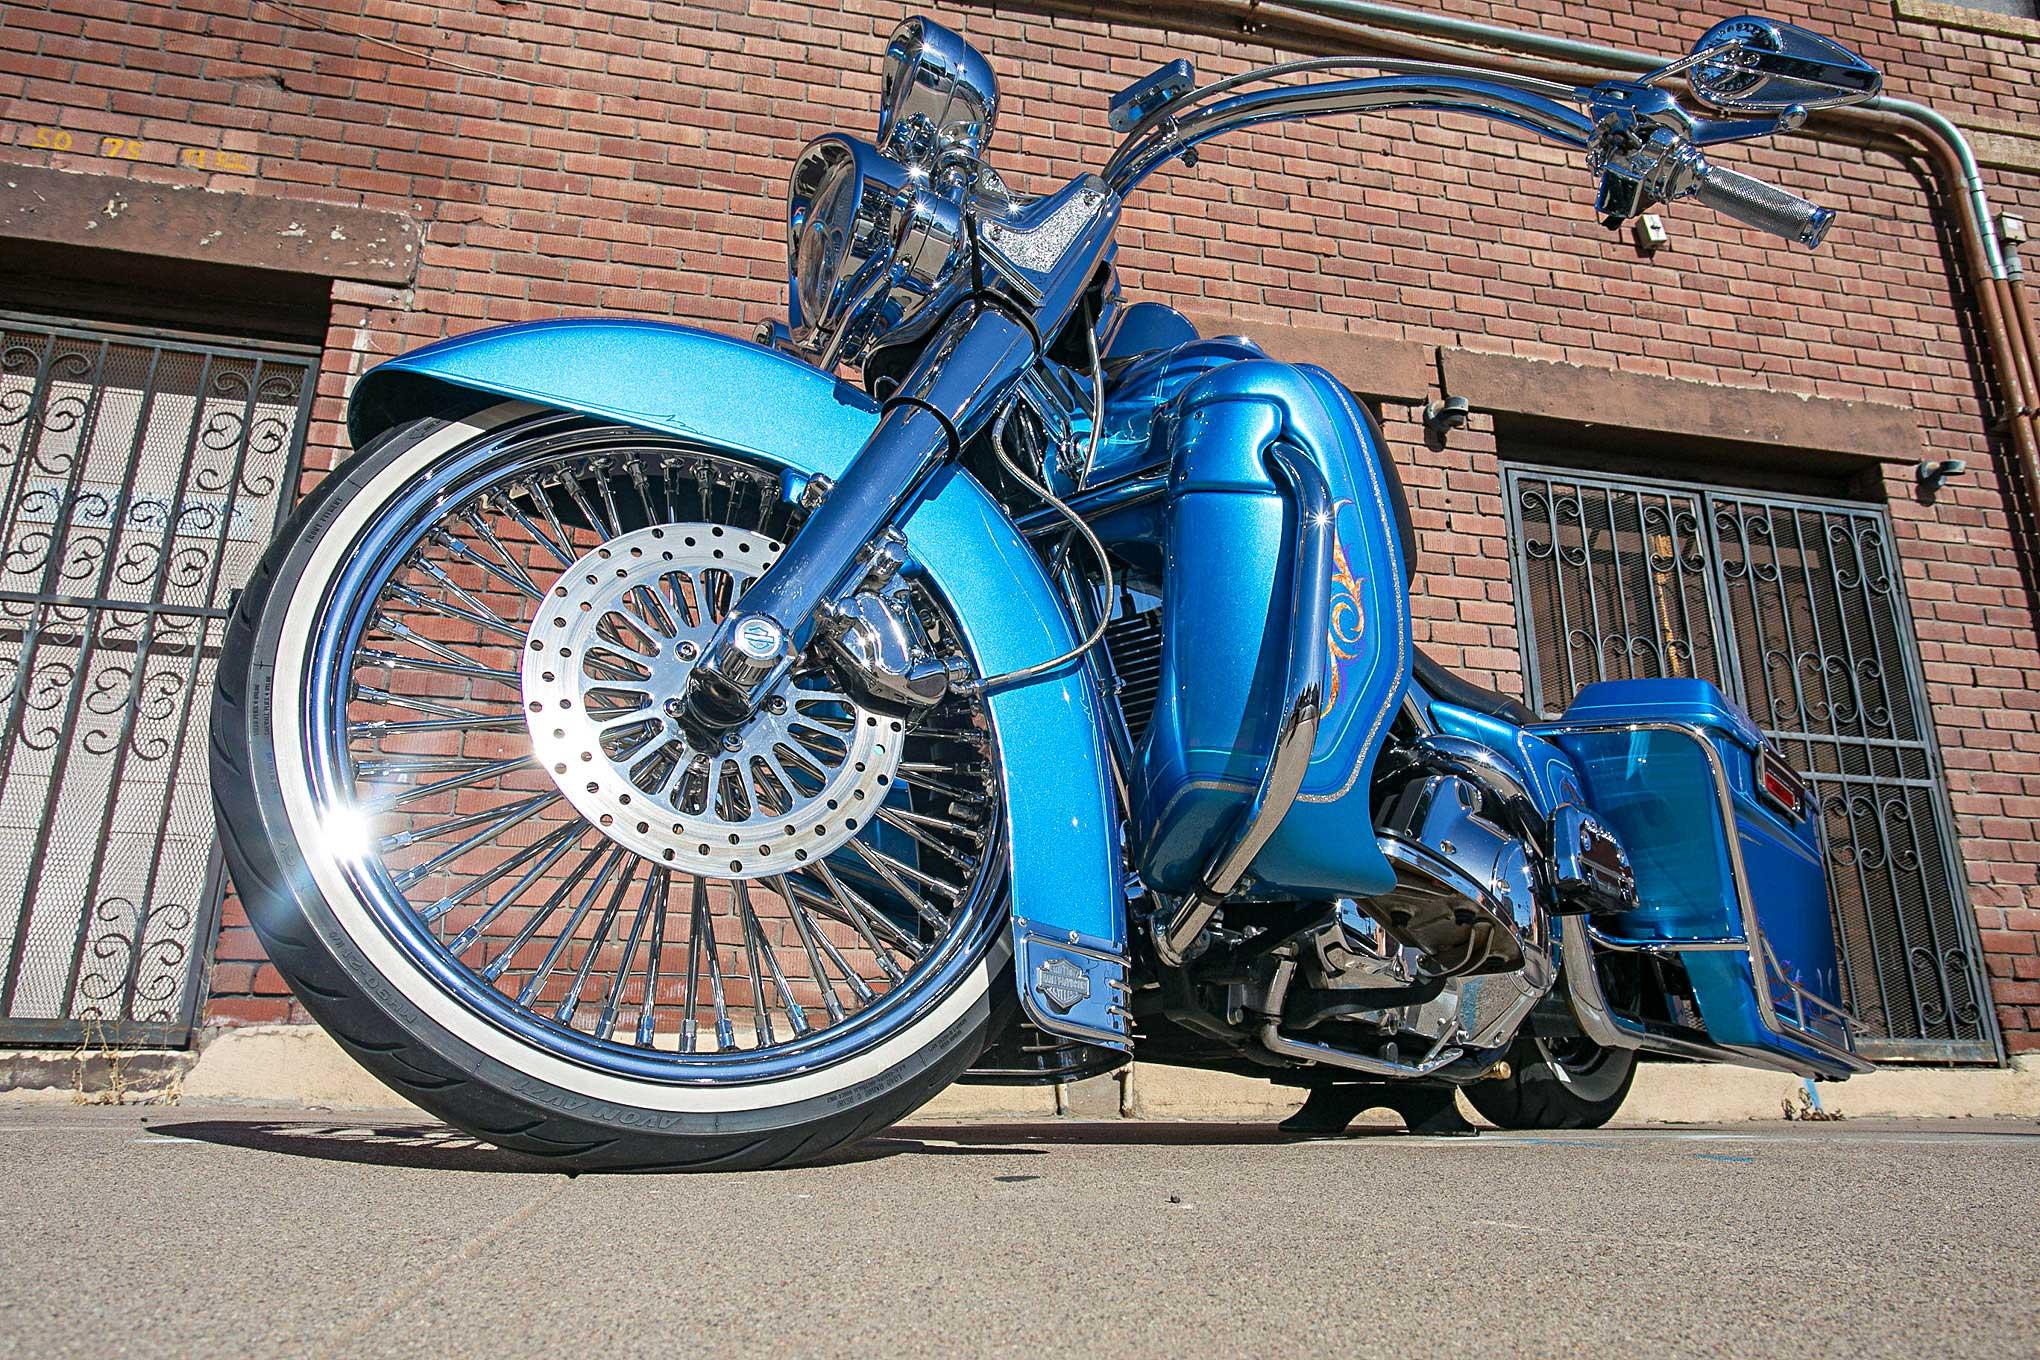 2006 Harley Davidson Road King American Wire Wheel - Lowrider